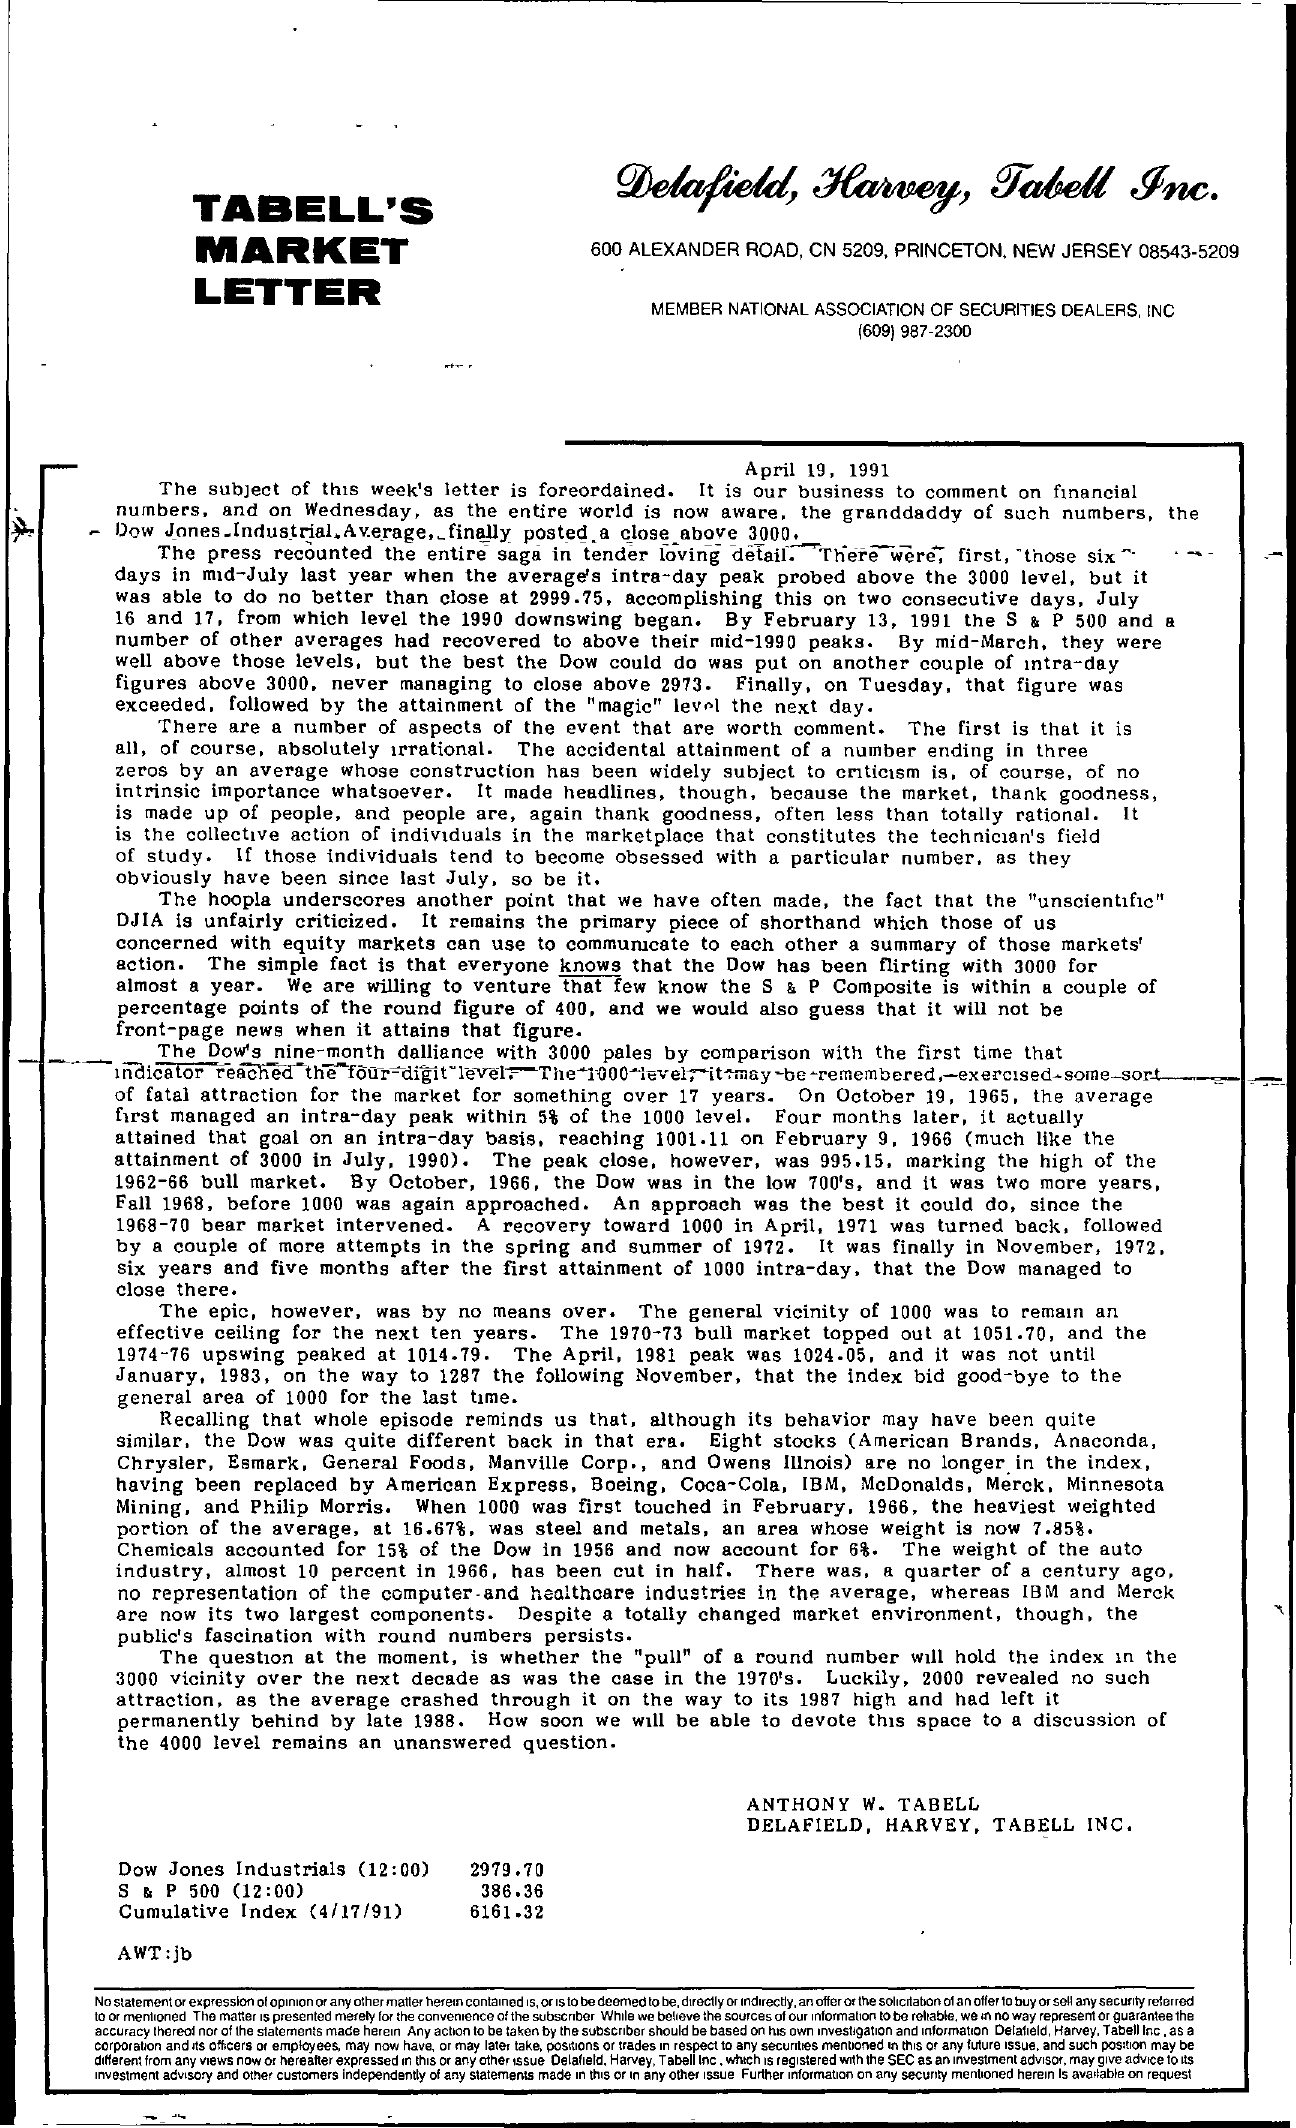 Tabell's Market Letter - April 19, 1991